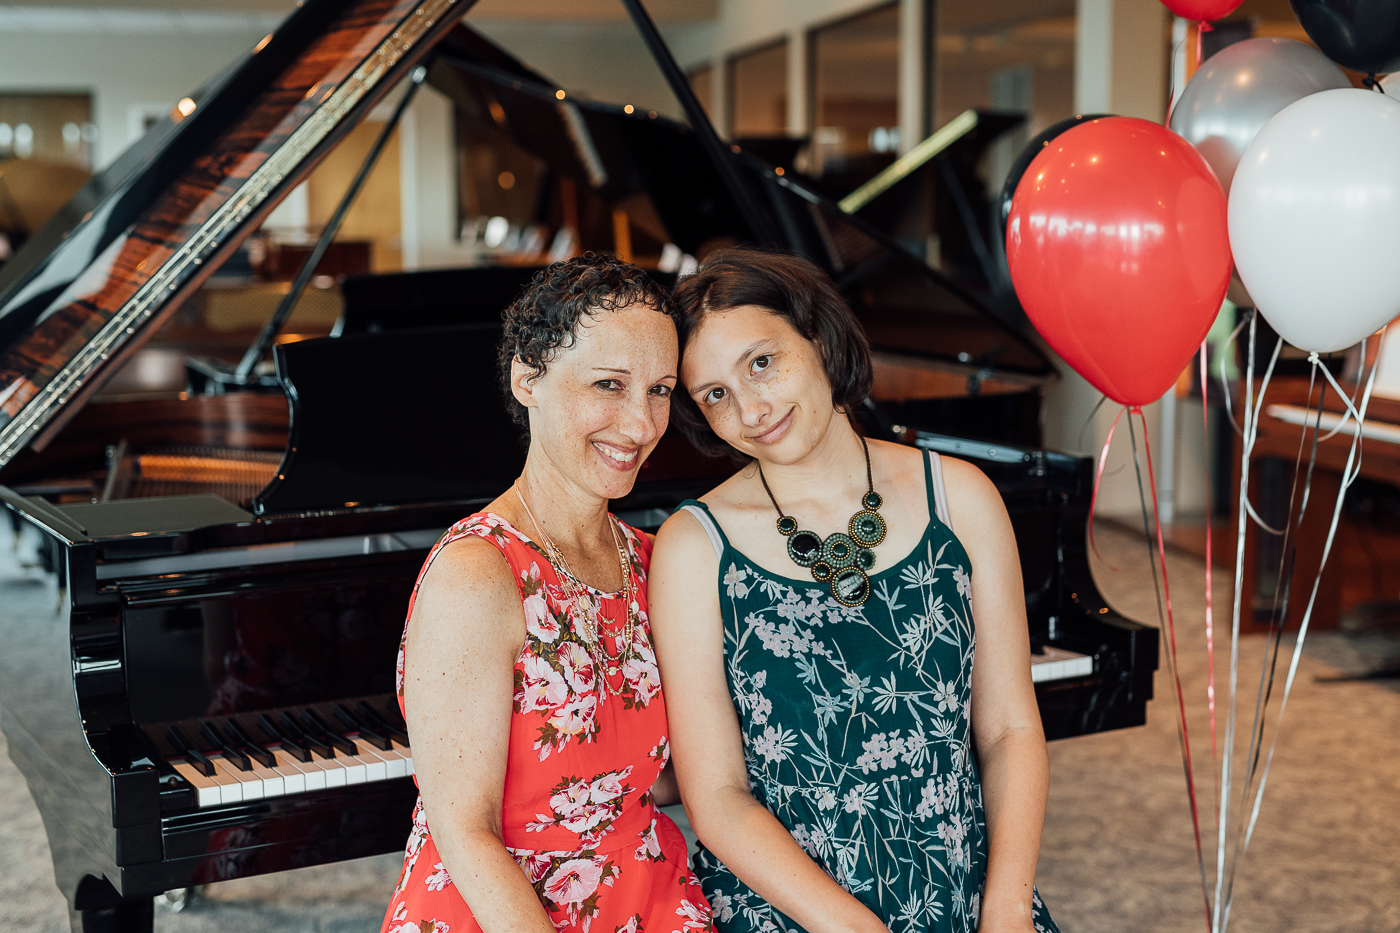 Piano Recital Resized for Web-54